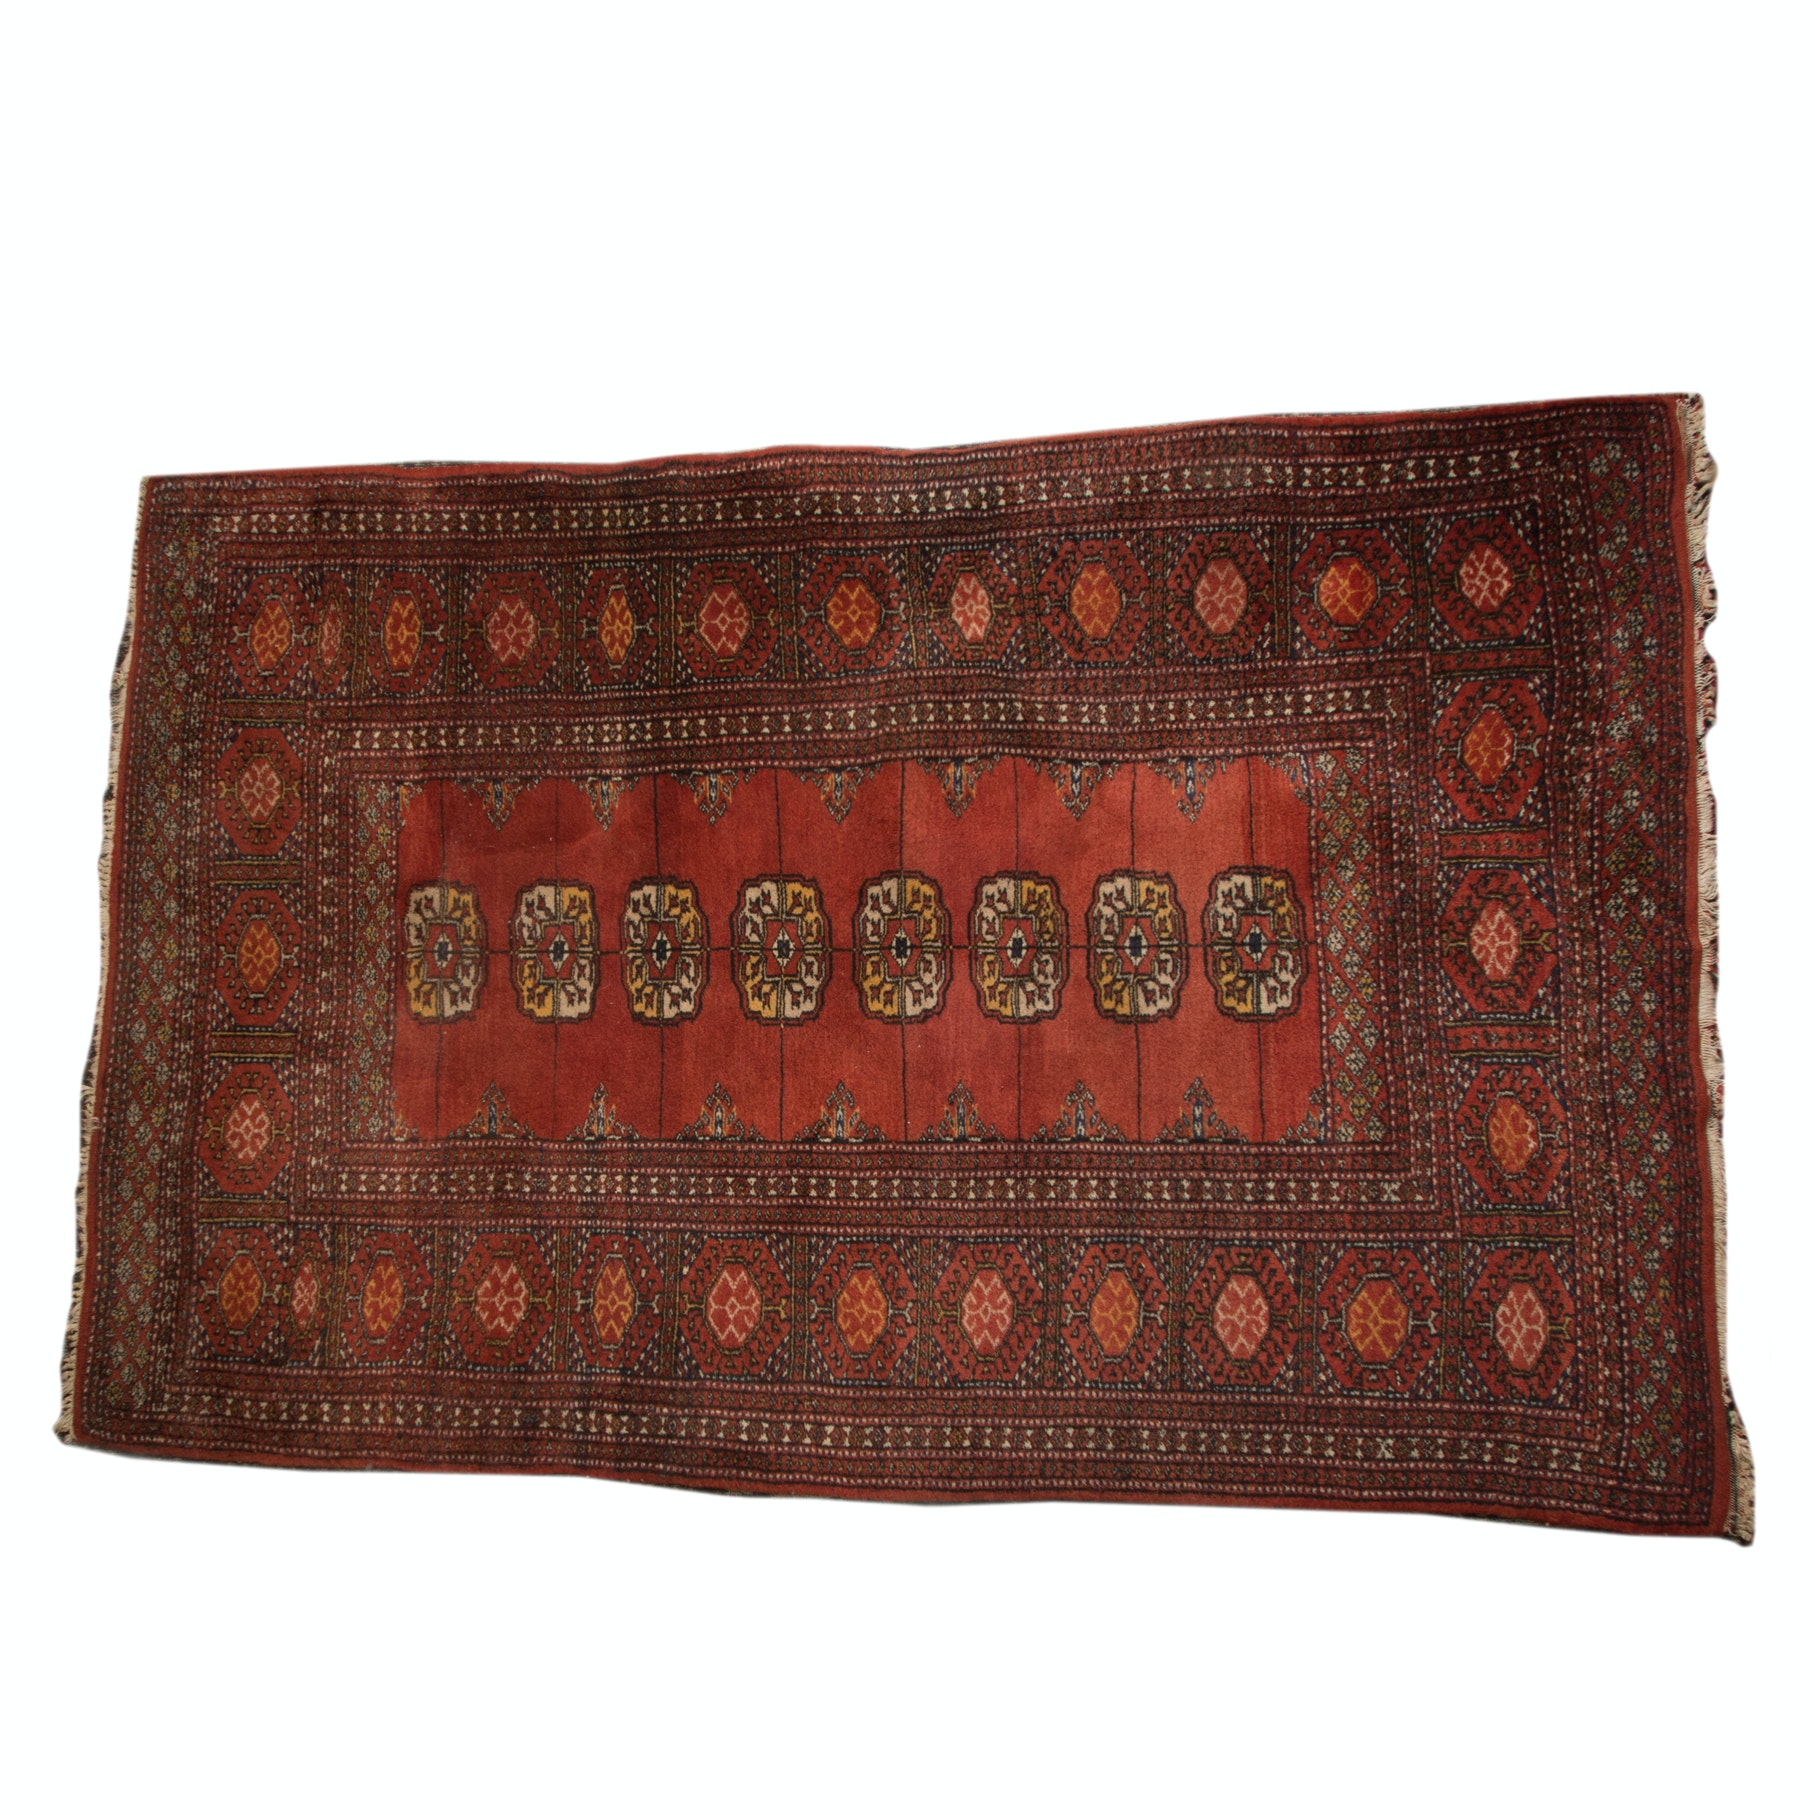 Vintage Hand Woven Bokhara Rug